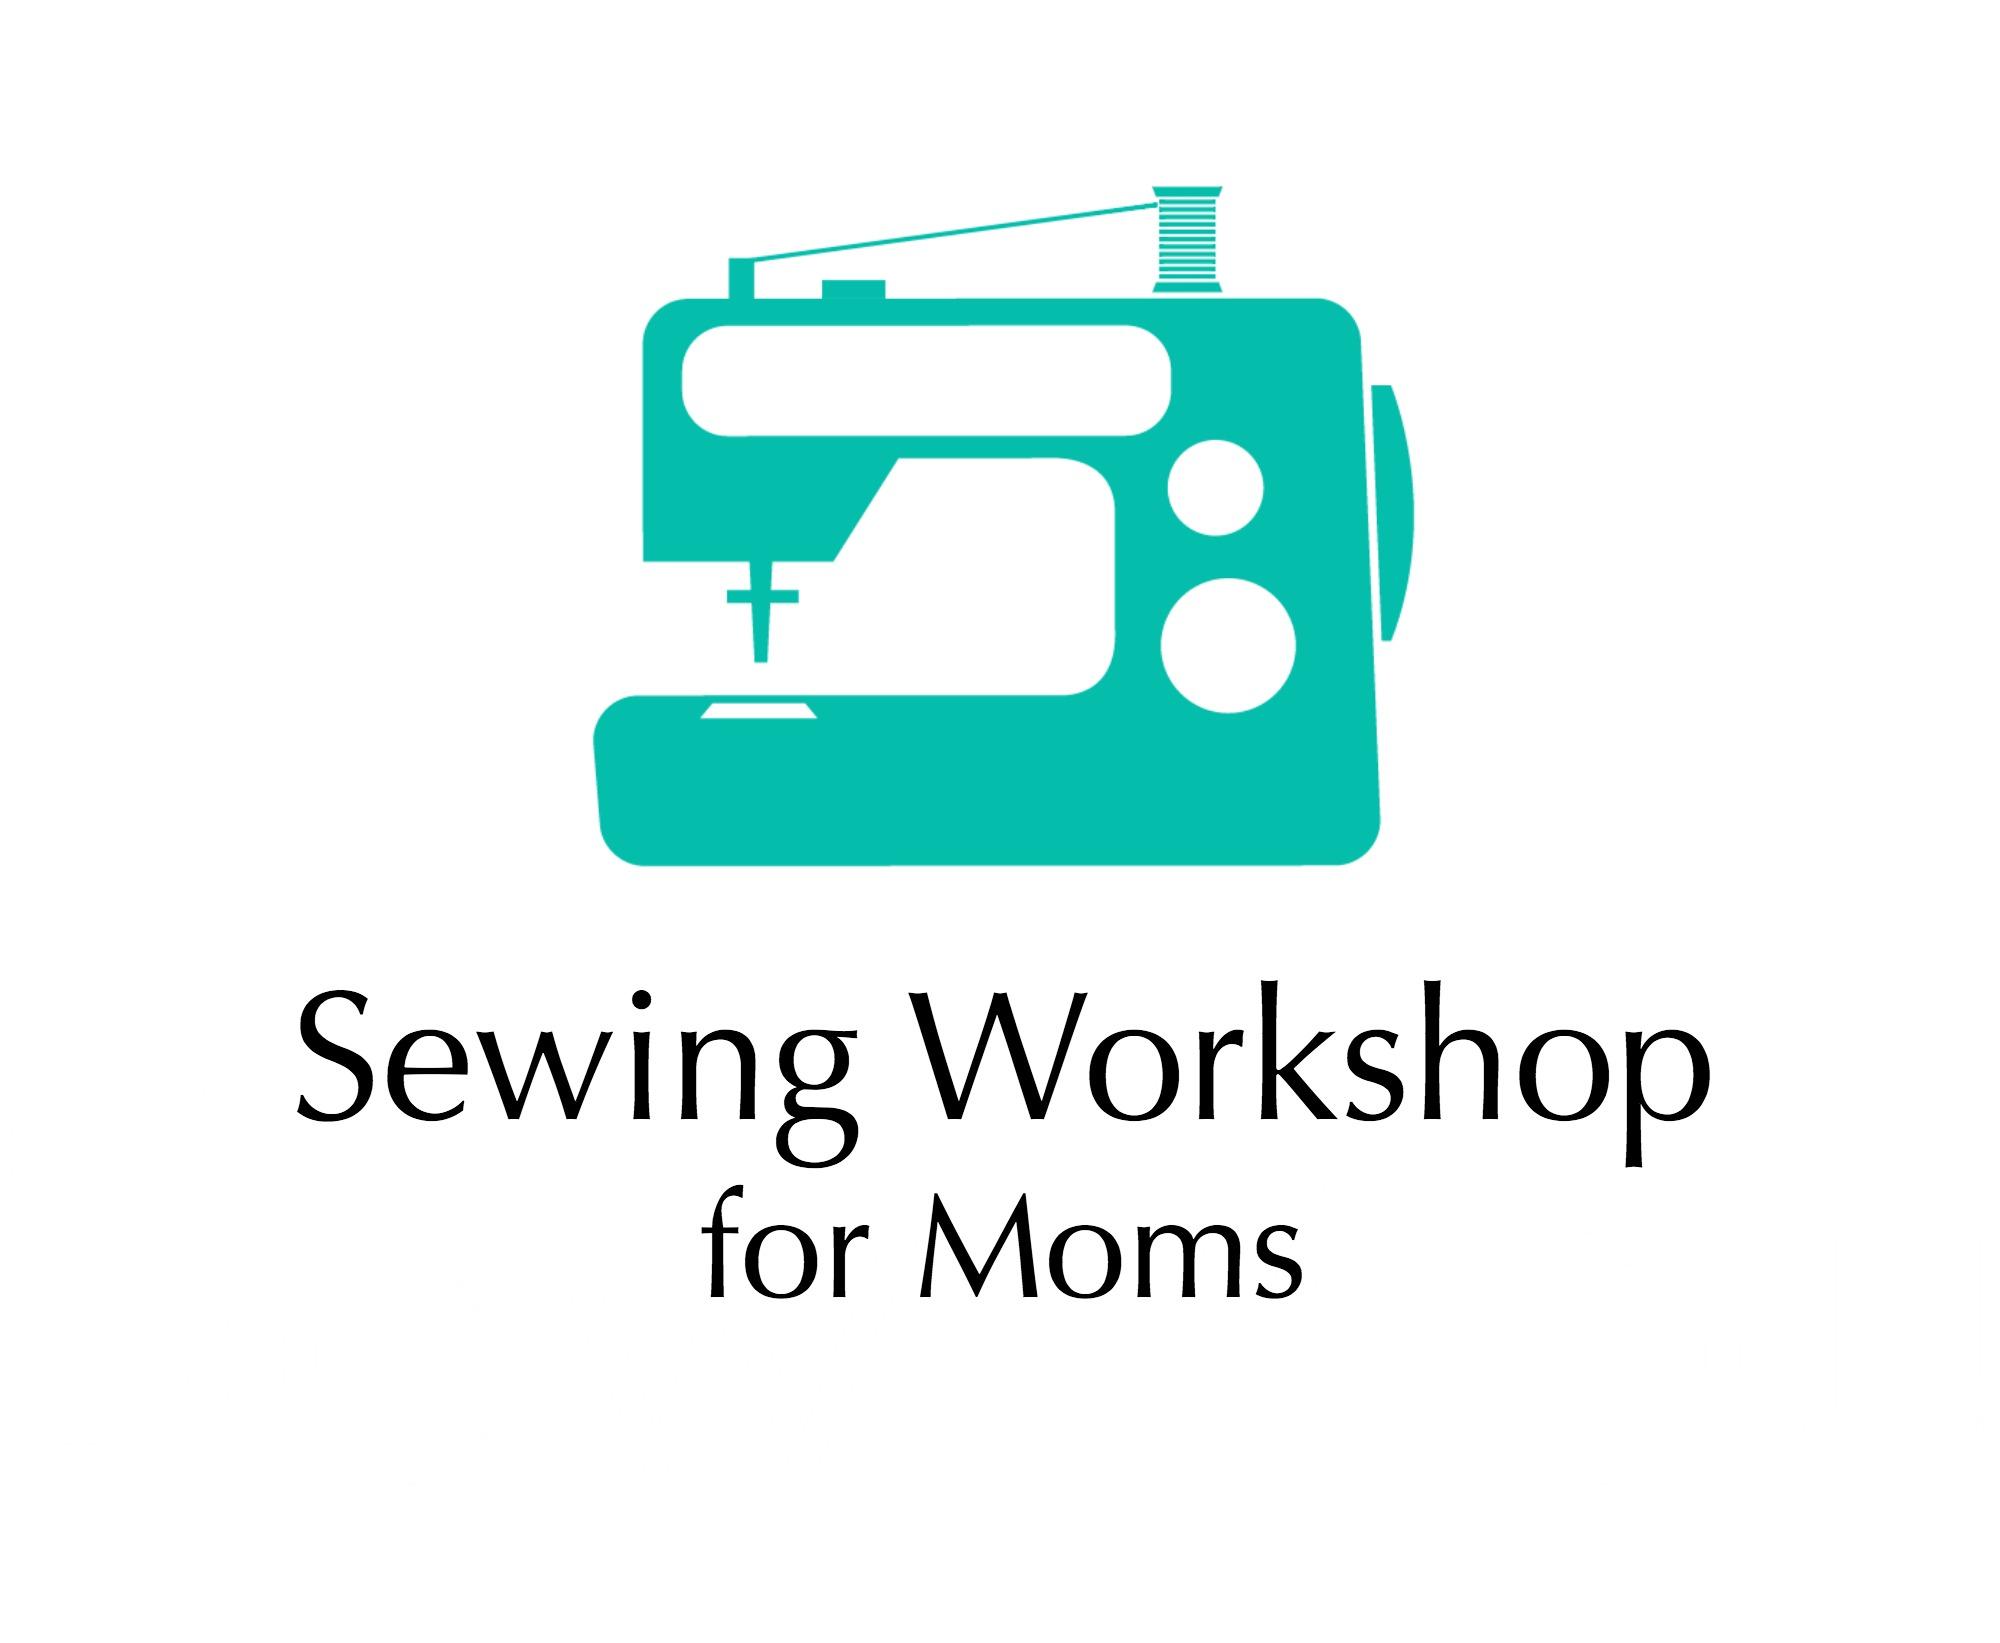 Sewing Workshop for Moms   Sew You Studio.com